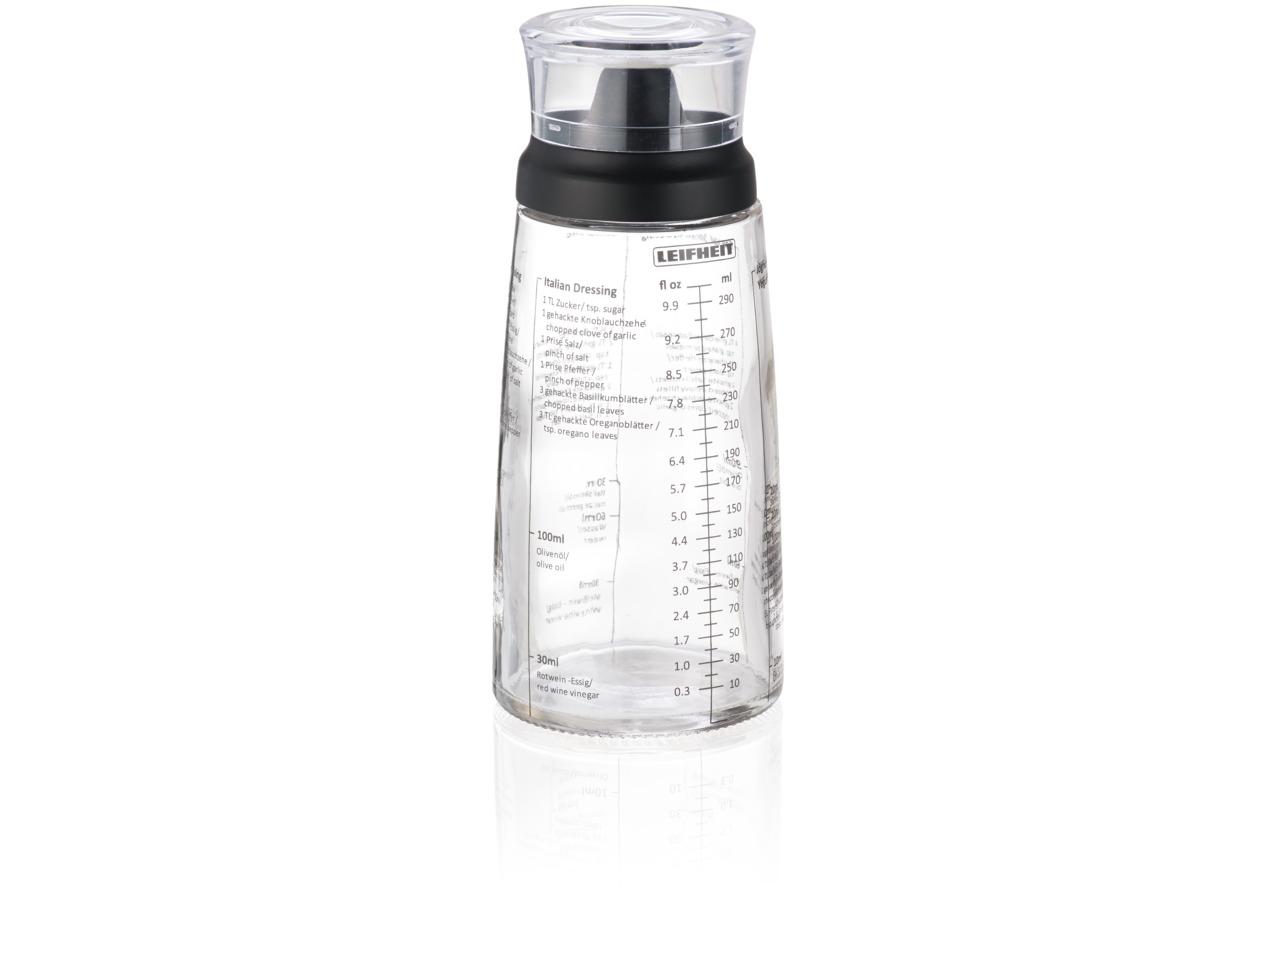 LEIFHEIT 3195 Salad Dressing Shaker